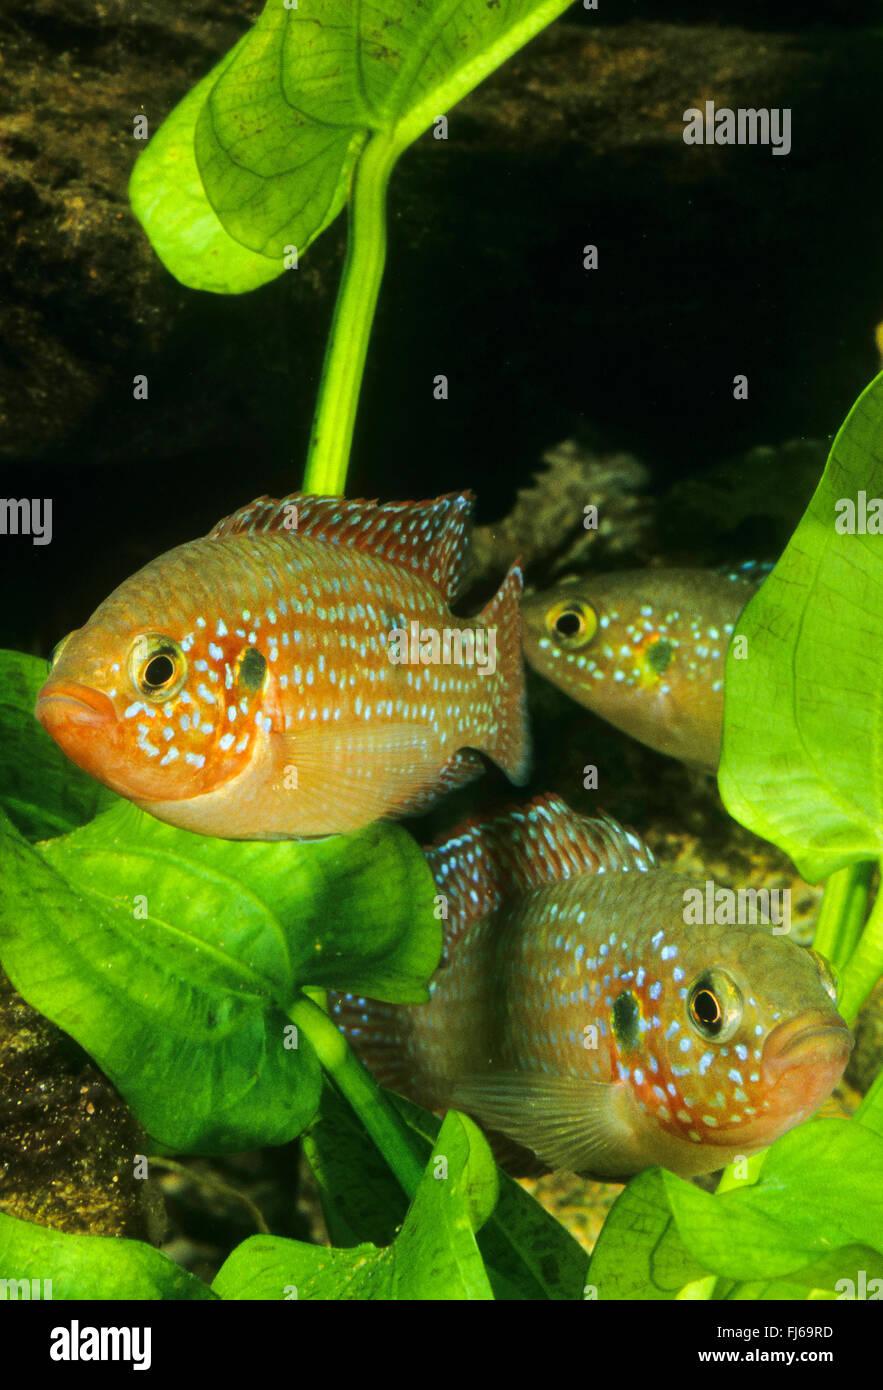 Freshwater jewel fish - Blood Red Jewel Fish Blood Red Jewel Hemichromis Lifalili Three Blood Red Jewel Fishes